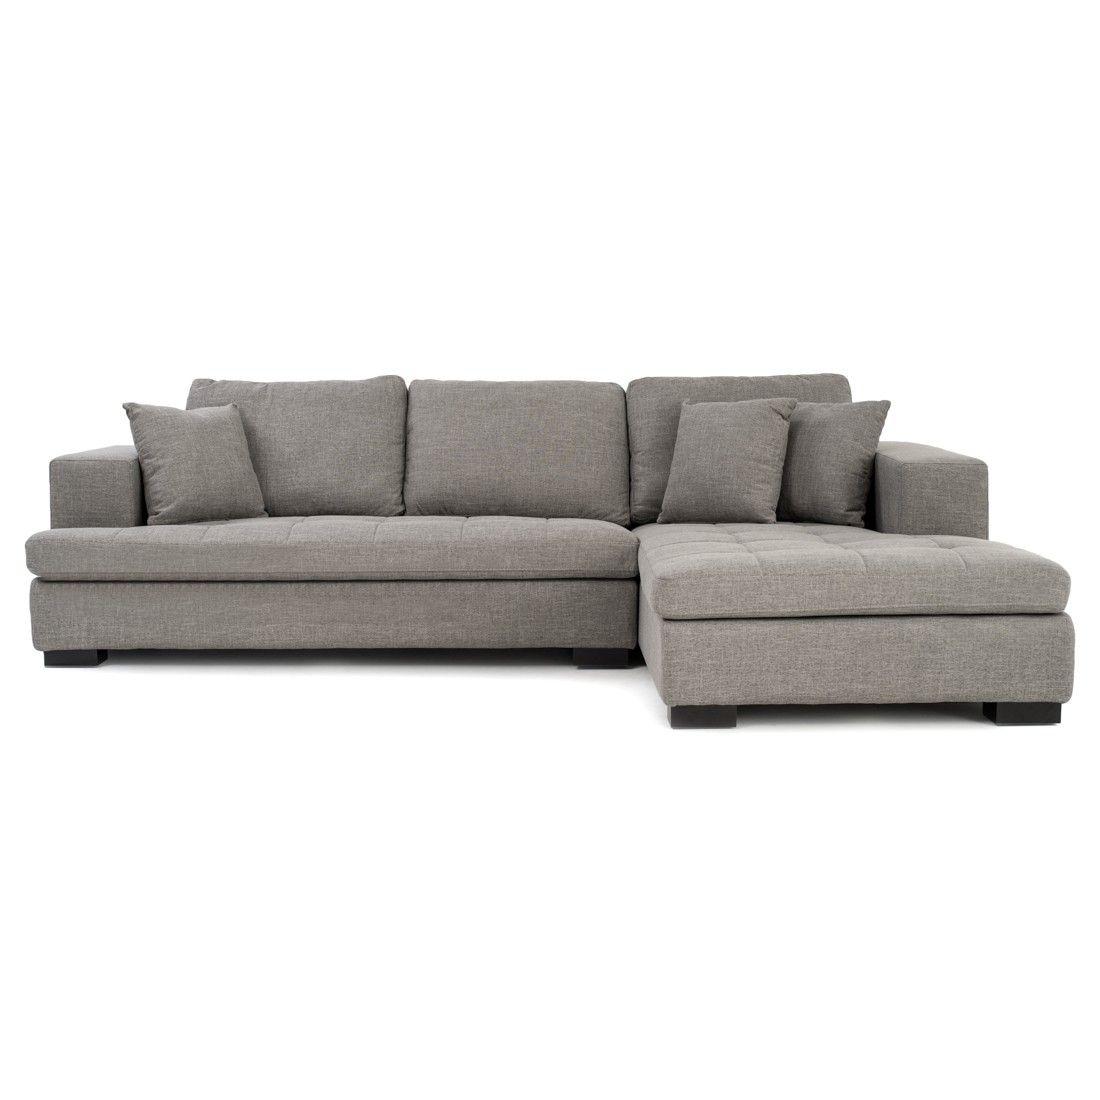 Metropolitan   Canapes throughout Mobilia Sectional Sofas (Image 5 of 10)